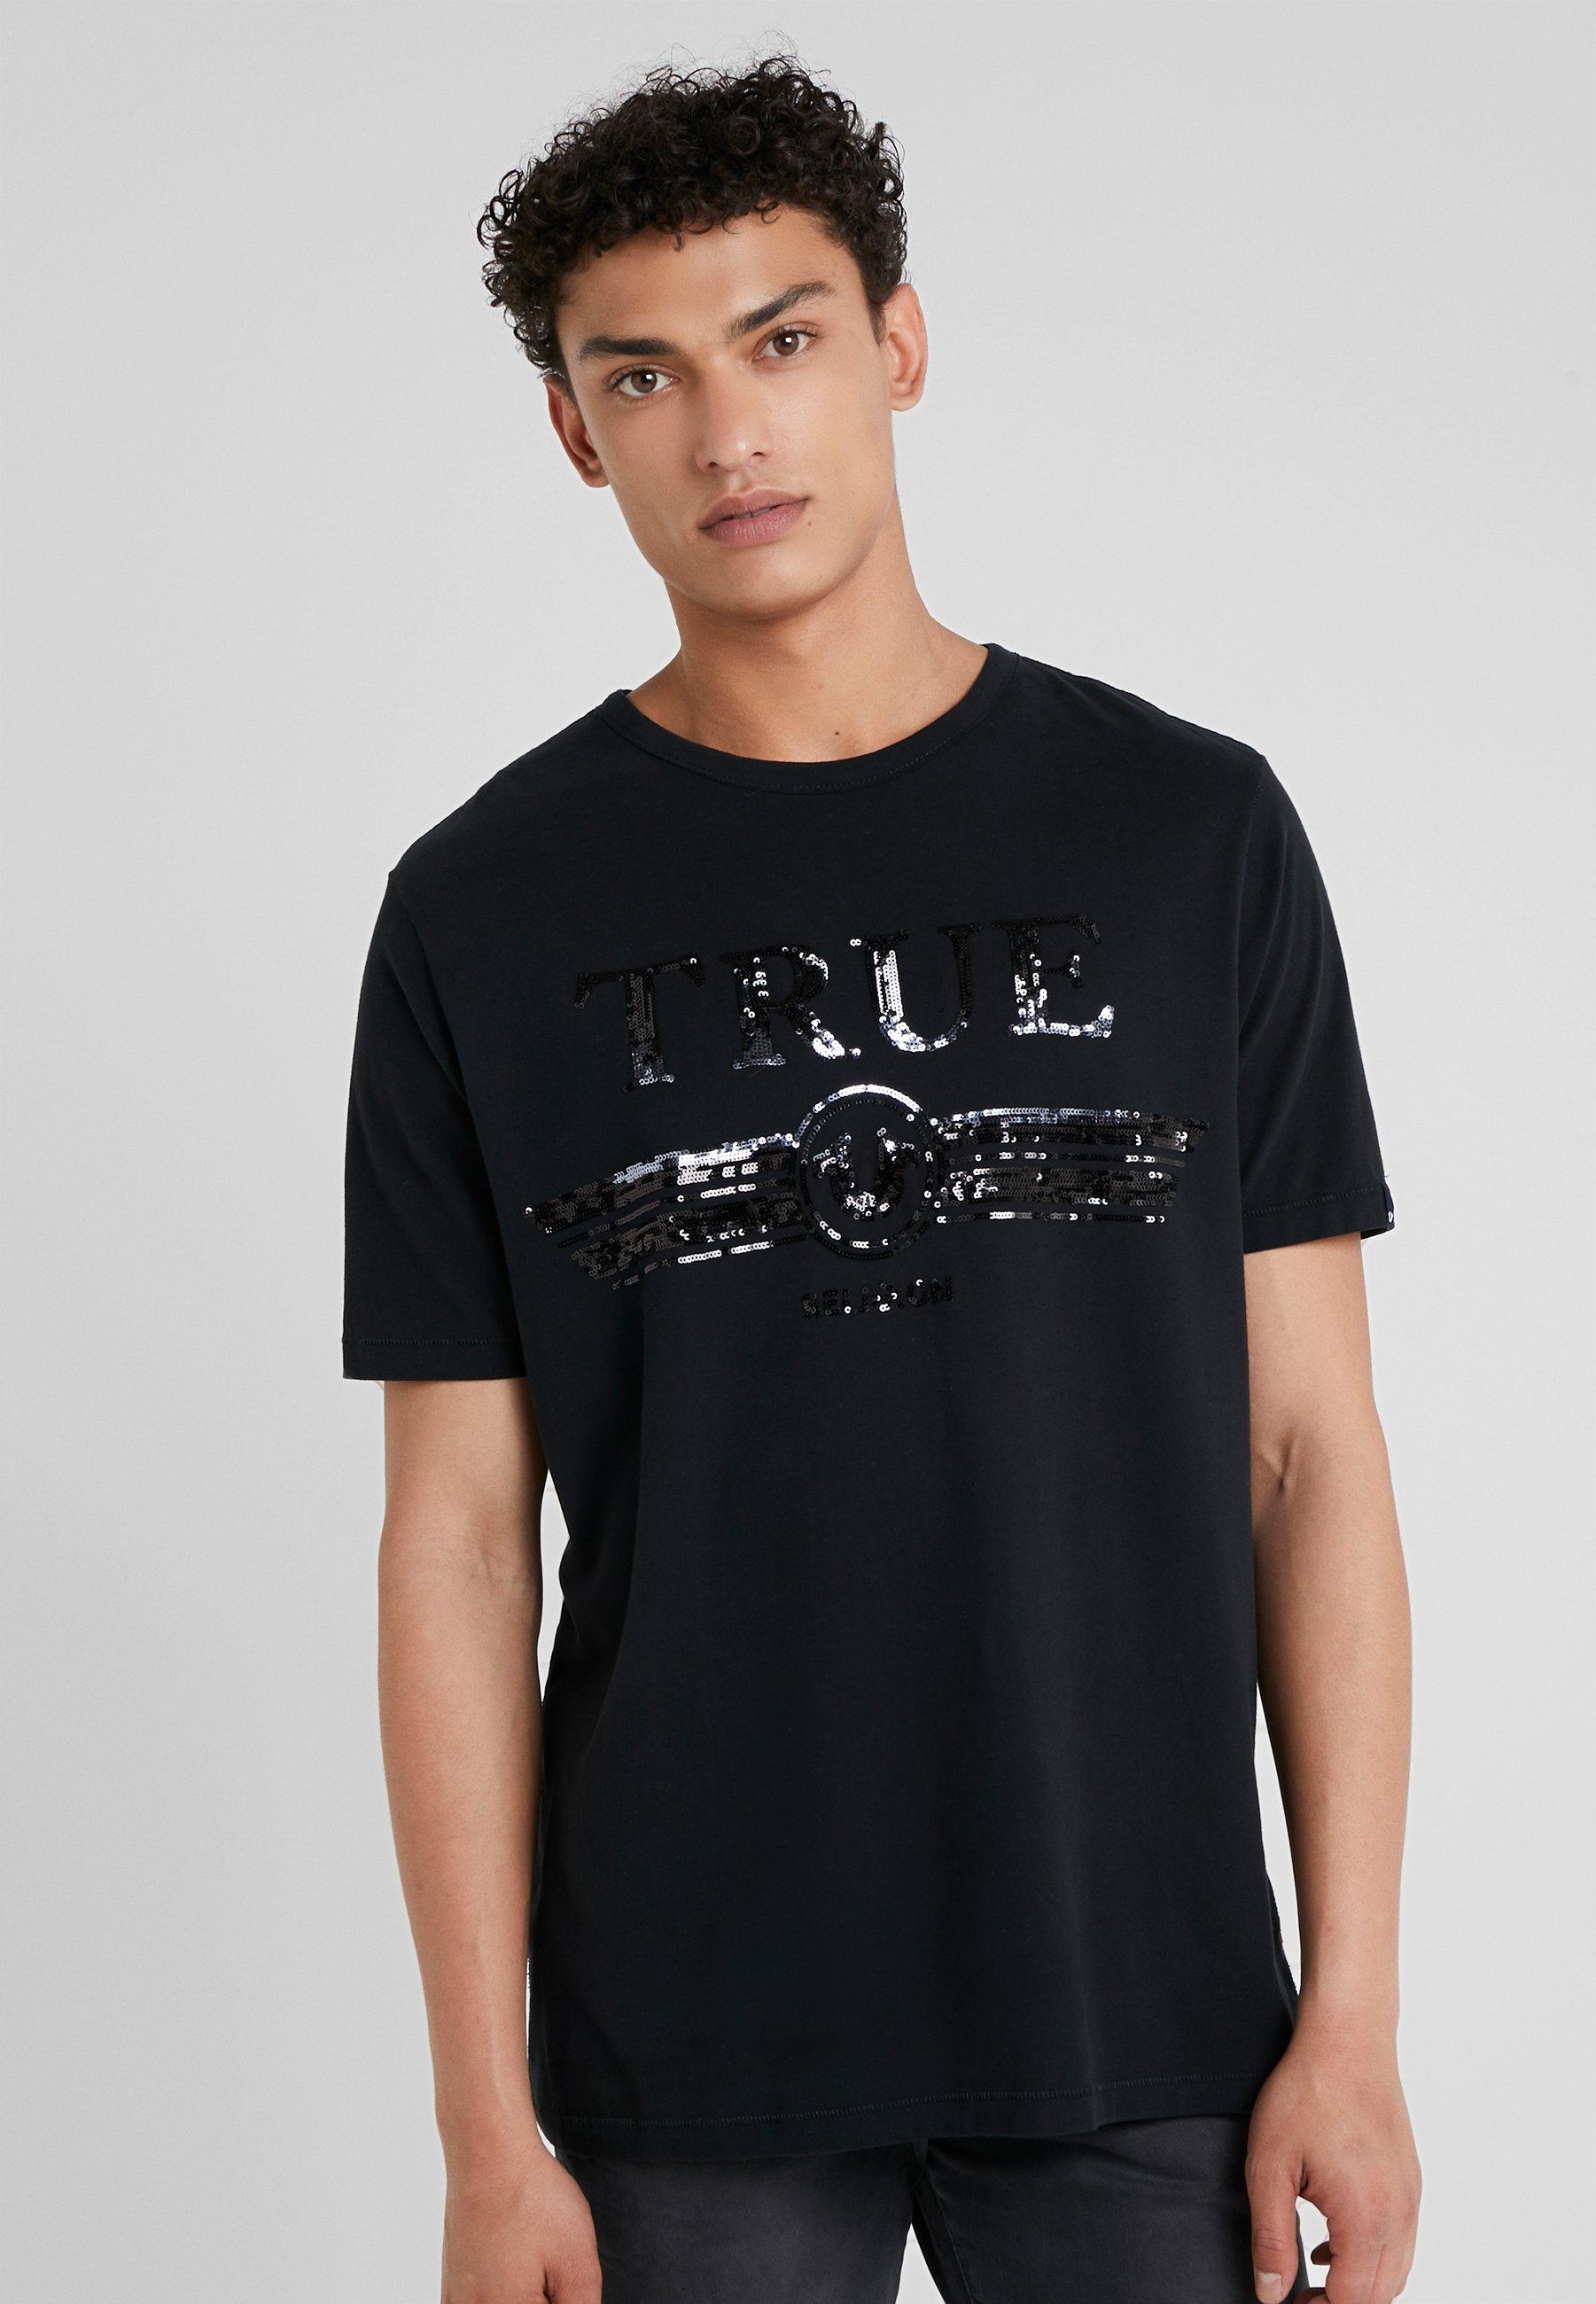 Religion Imprimé EmbroyderyT Black True shirt Trucci fv76IbgYy